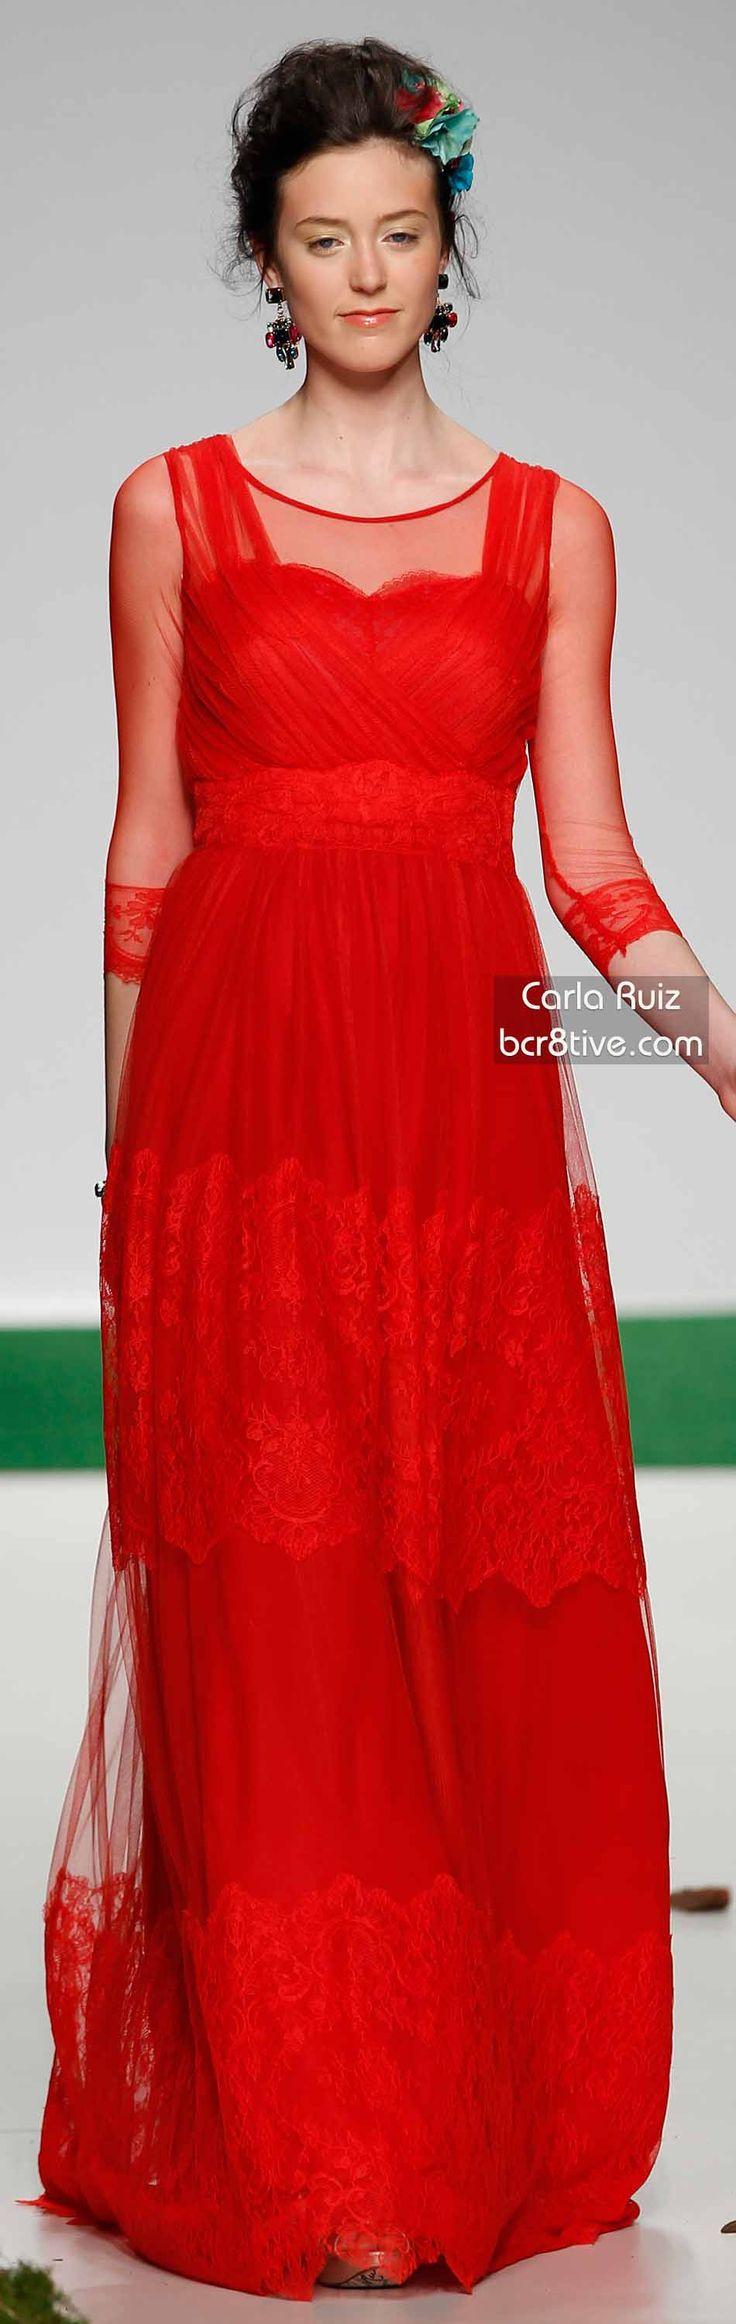 Nice red evening dress carla ruiz spring bridal check more at